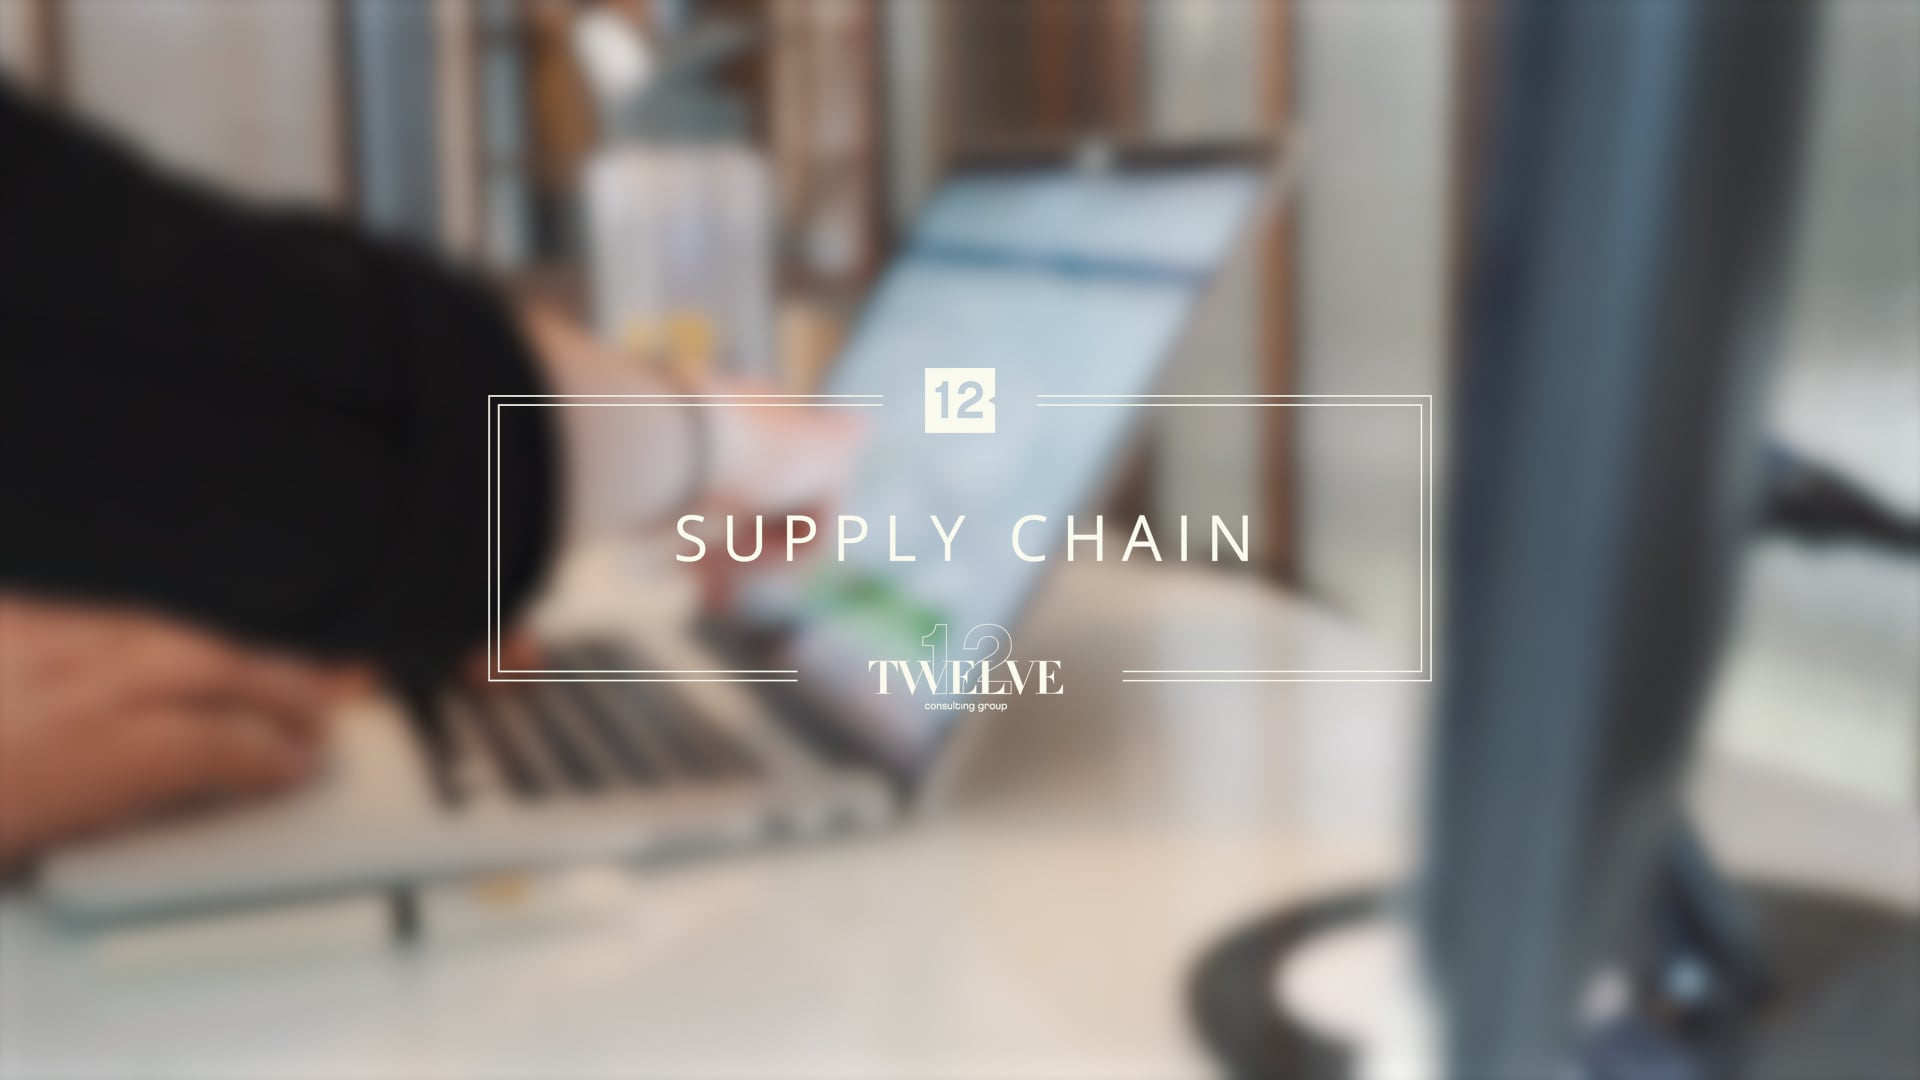 Supply Chain at Twelve